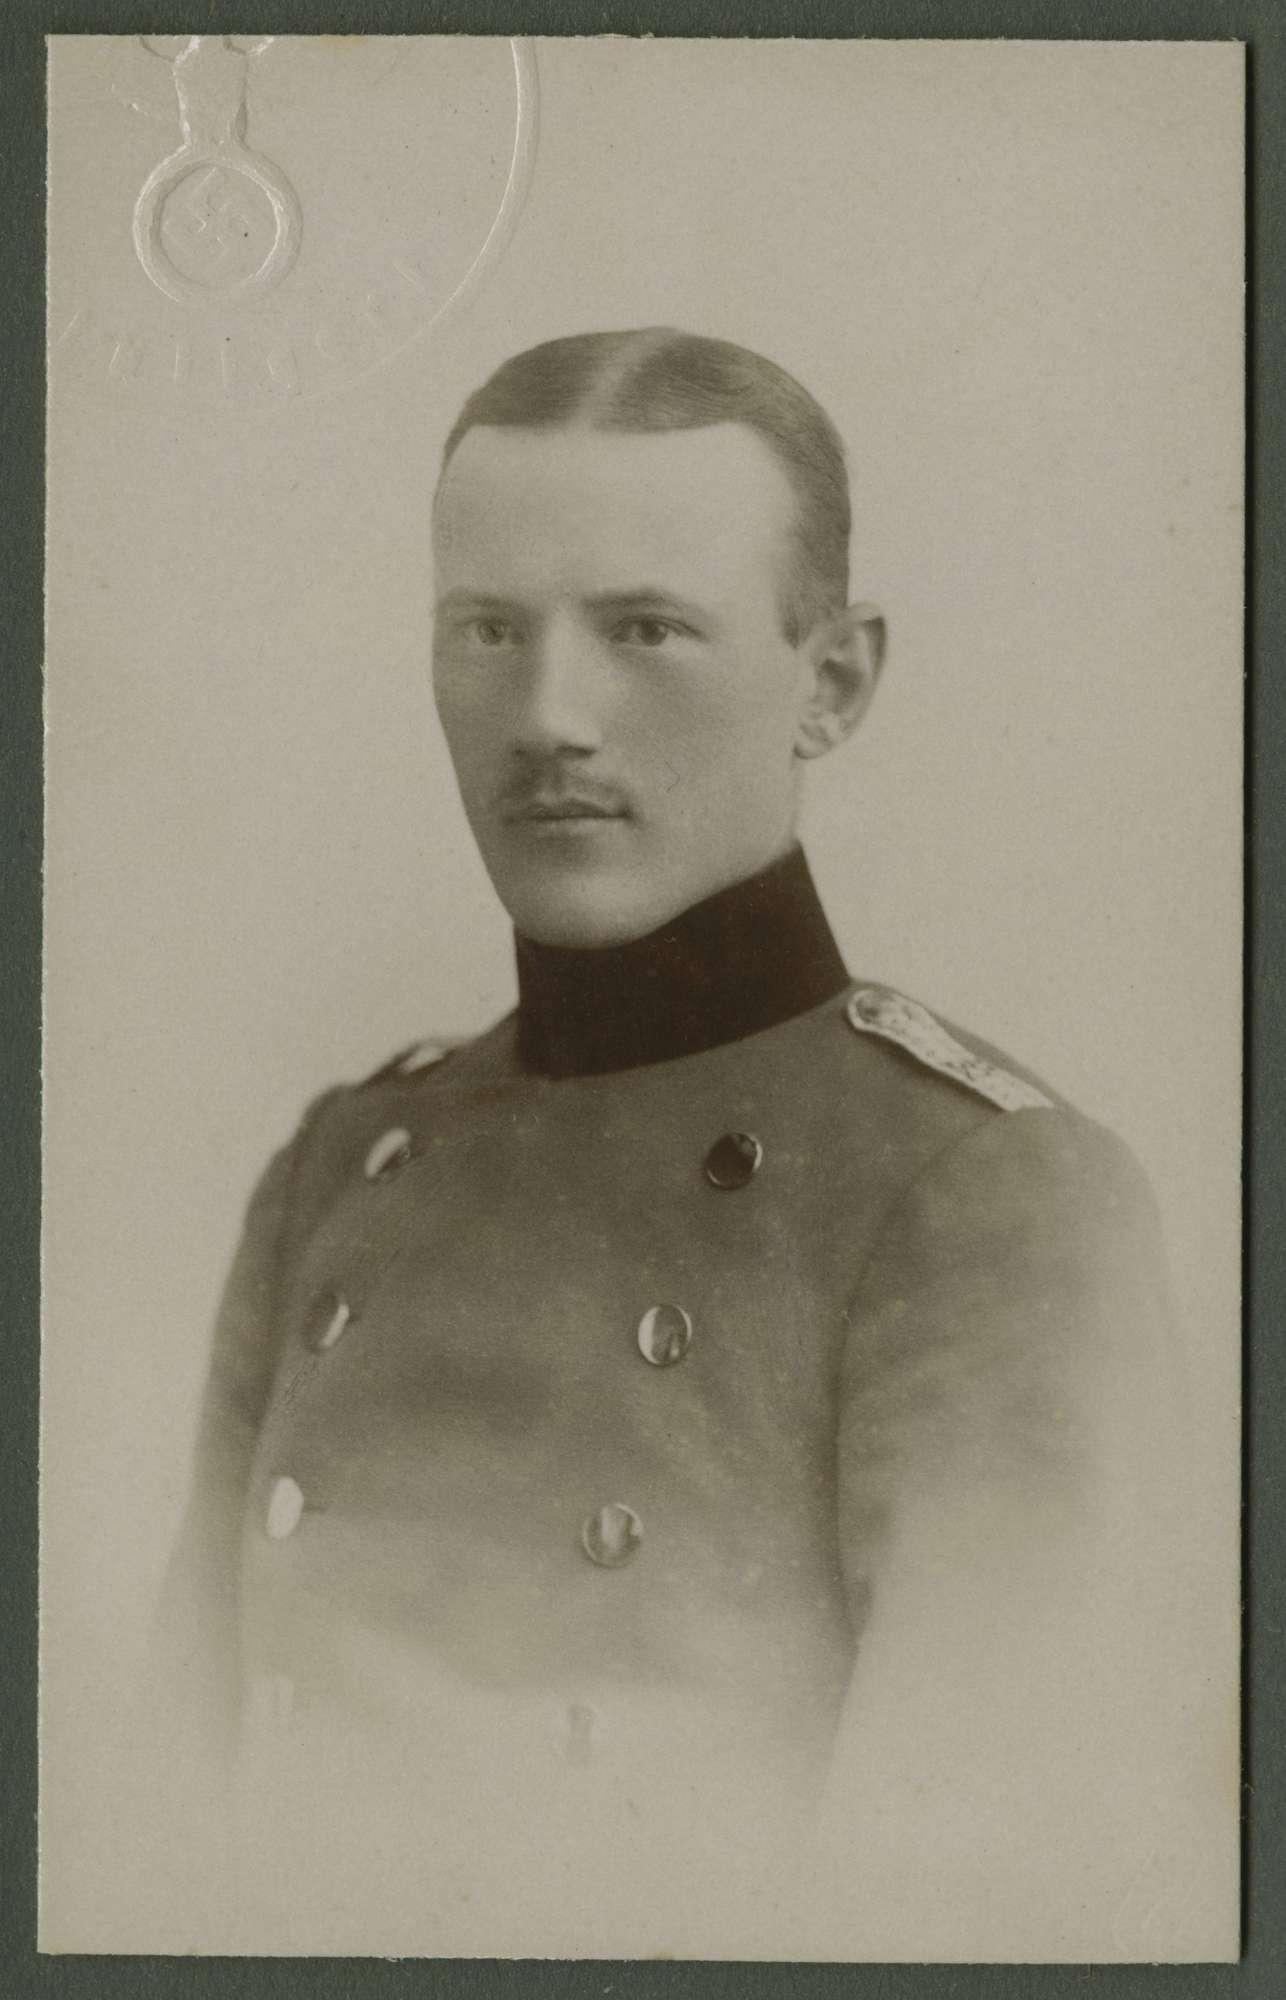 Breyer, (Eberhard Heinrich Wilhelm) Hugo, Bild 2